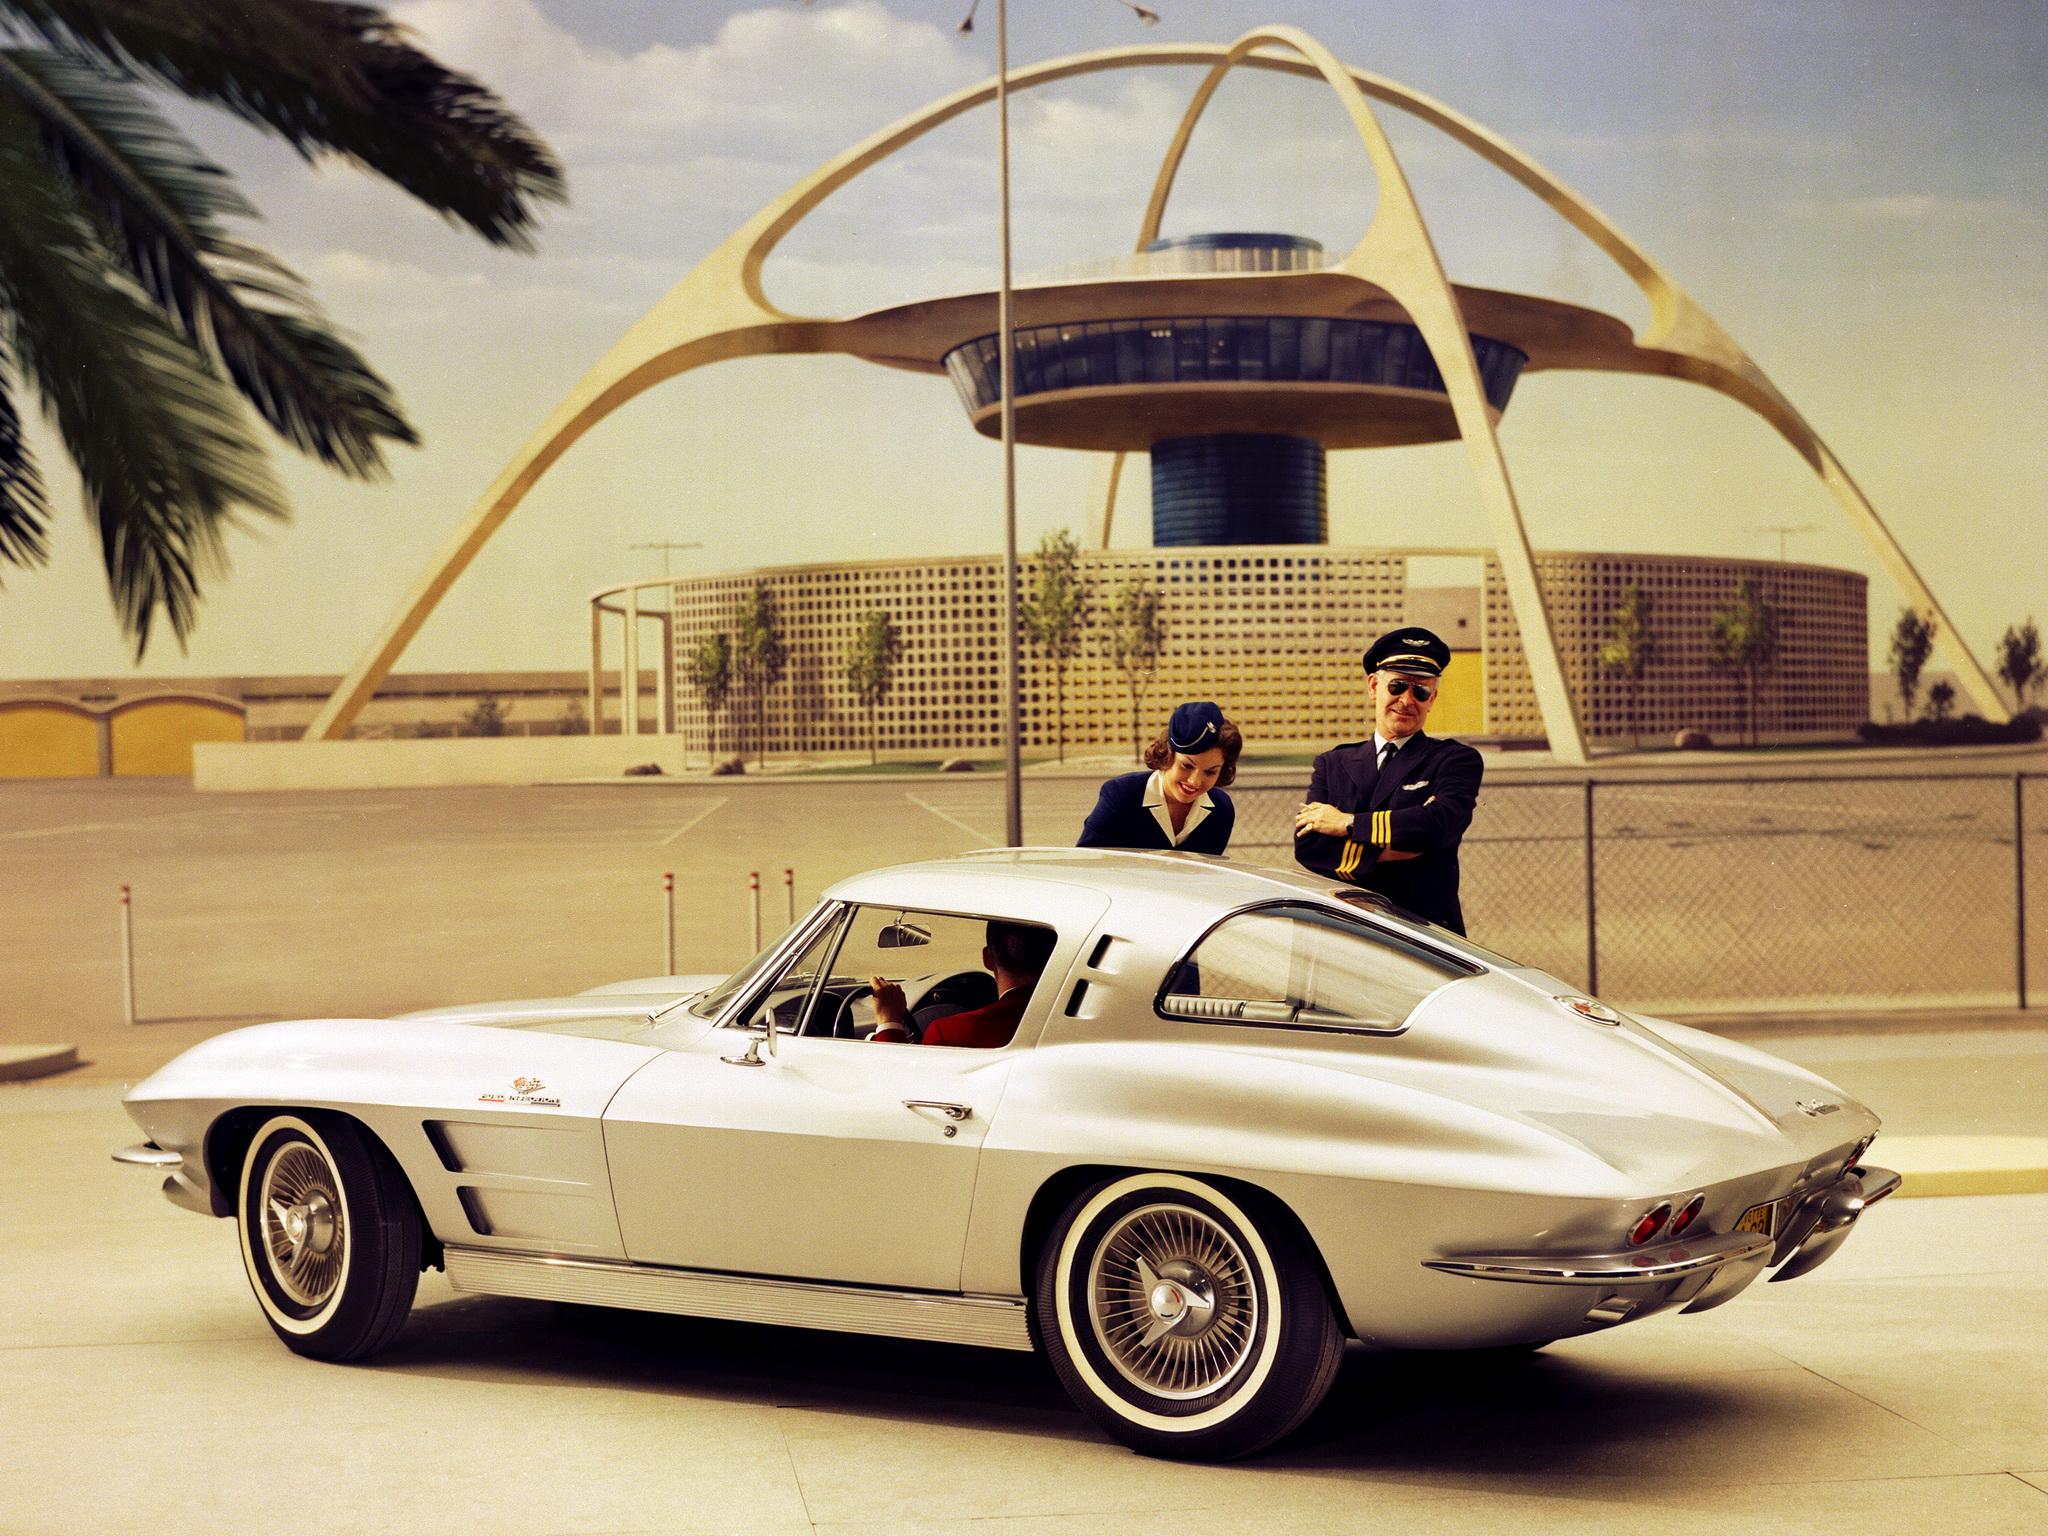 1963 chevrolet corvette sting ray l84 327 fuel injection c 2 supercar muscle classic j wallpaper. Black Bedroom Furniture Sets. Home Design Ideas